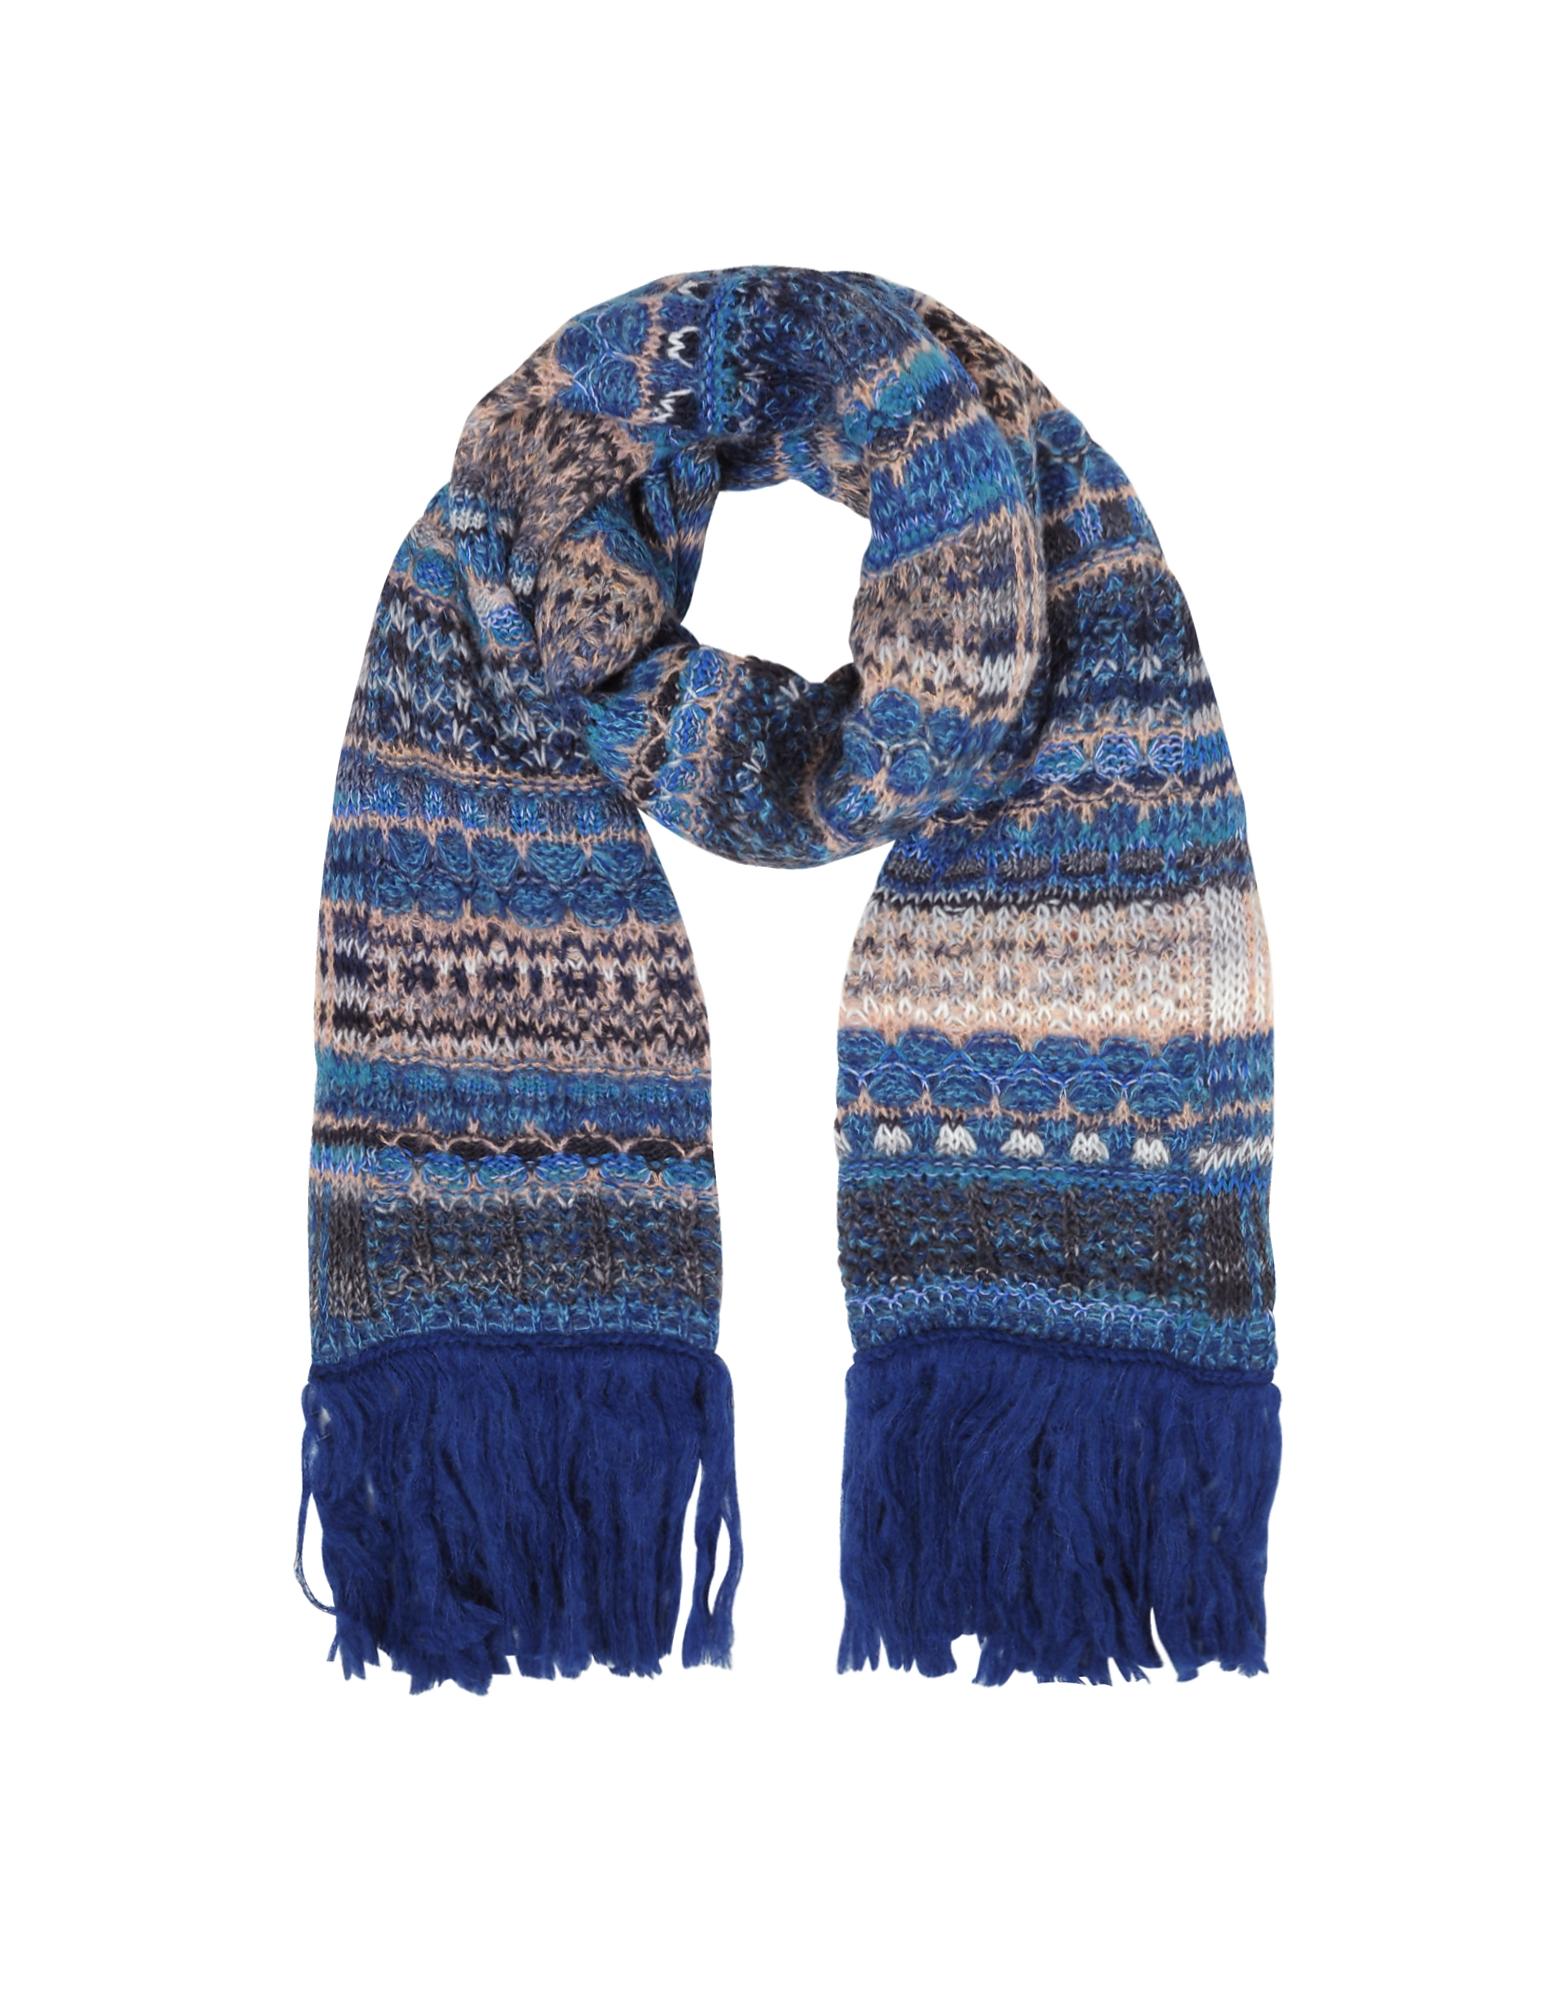 Wool Blend Knit Women's Long Scarf w/Maxi Fringes